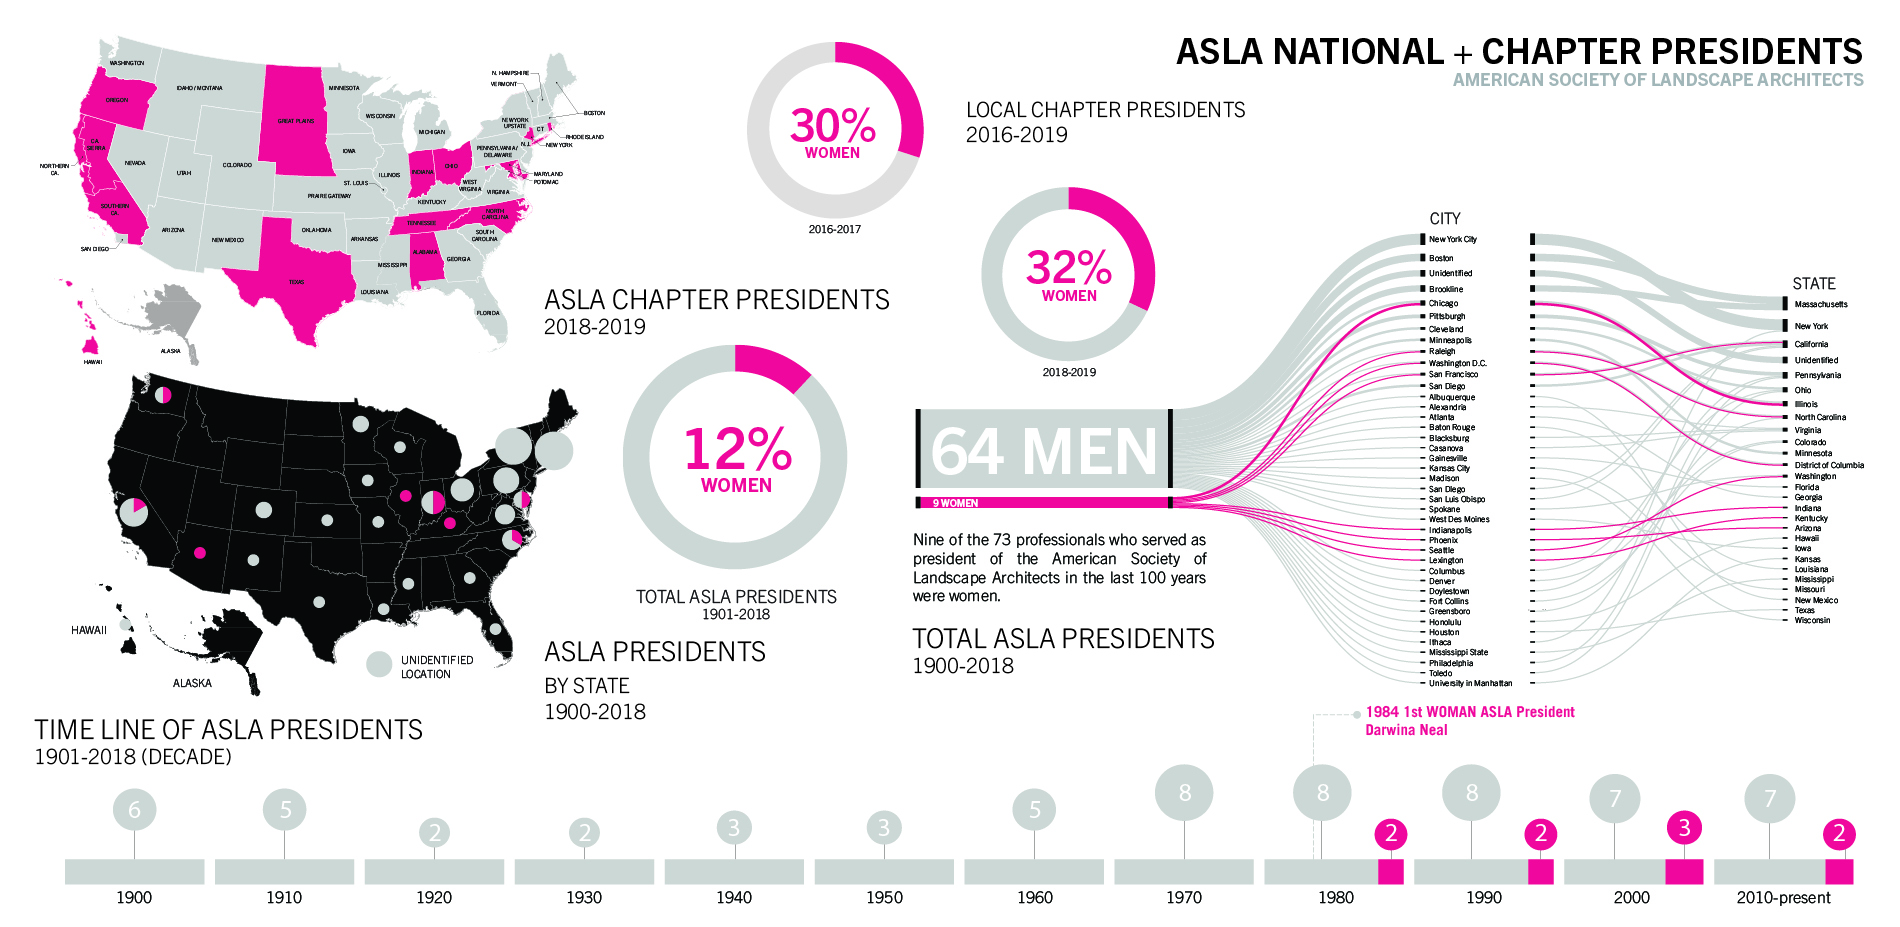 ASLA National + Chapter Presidents